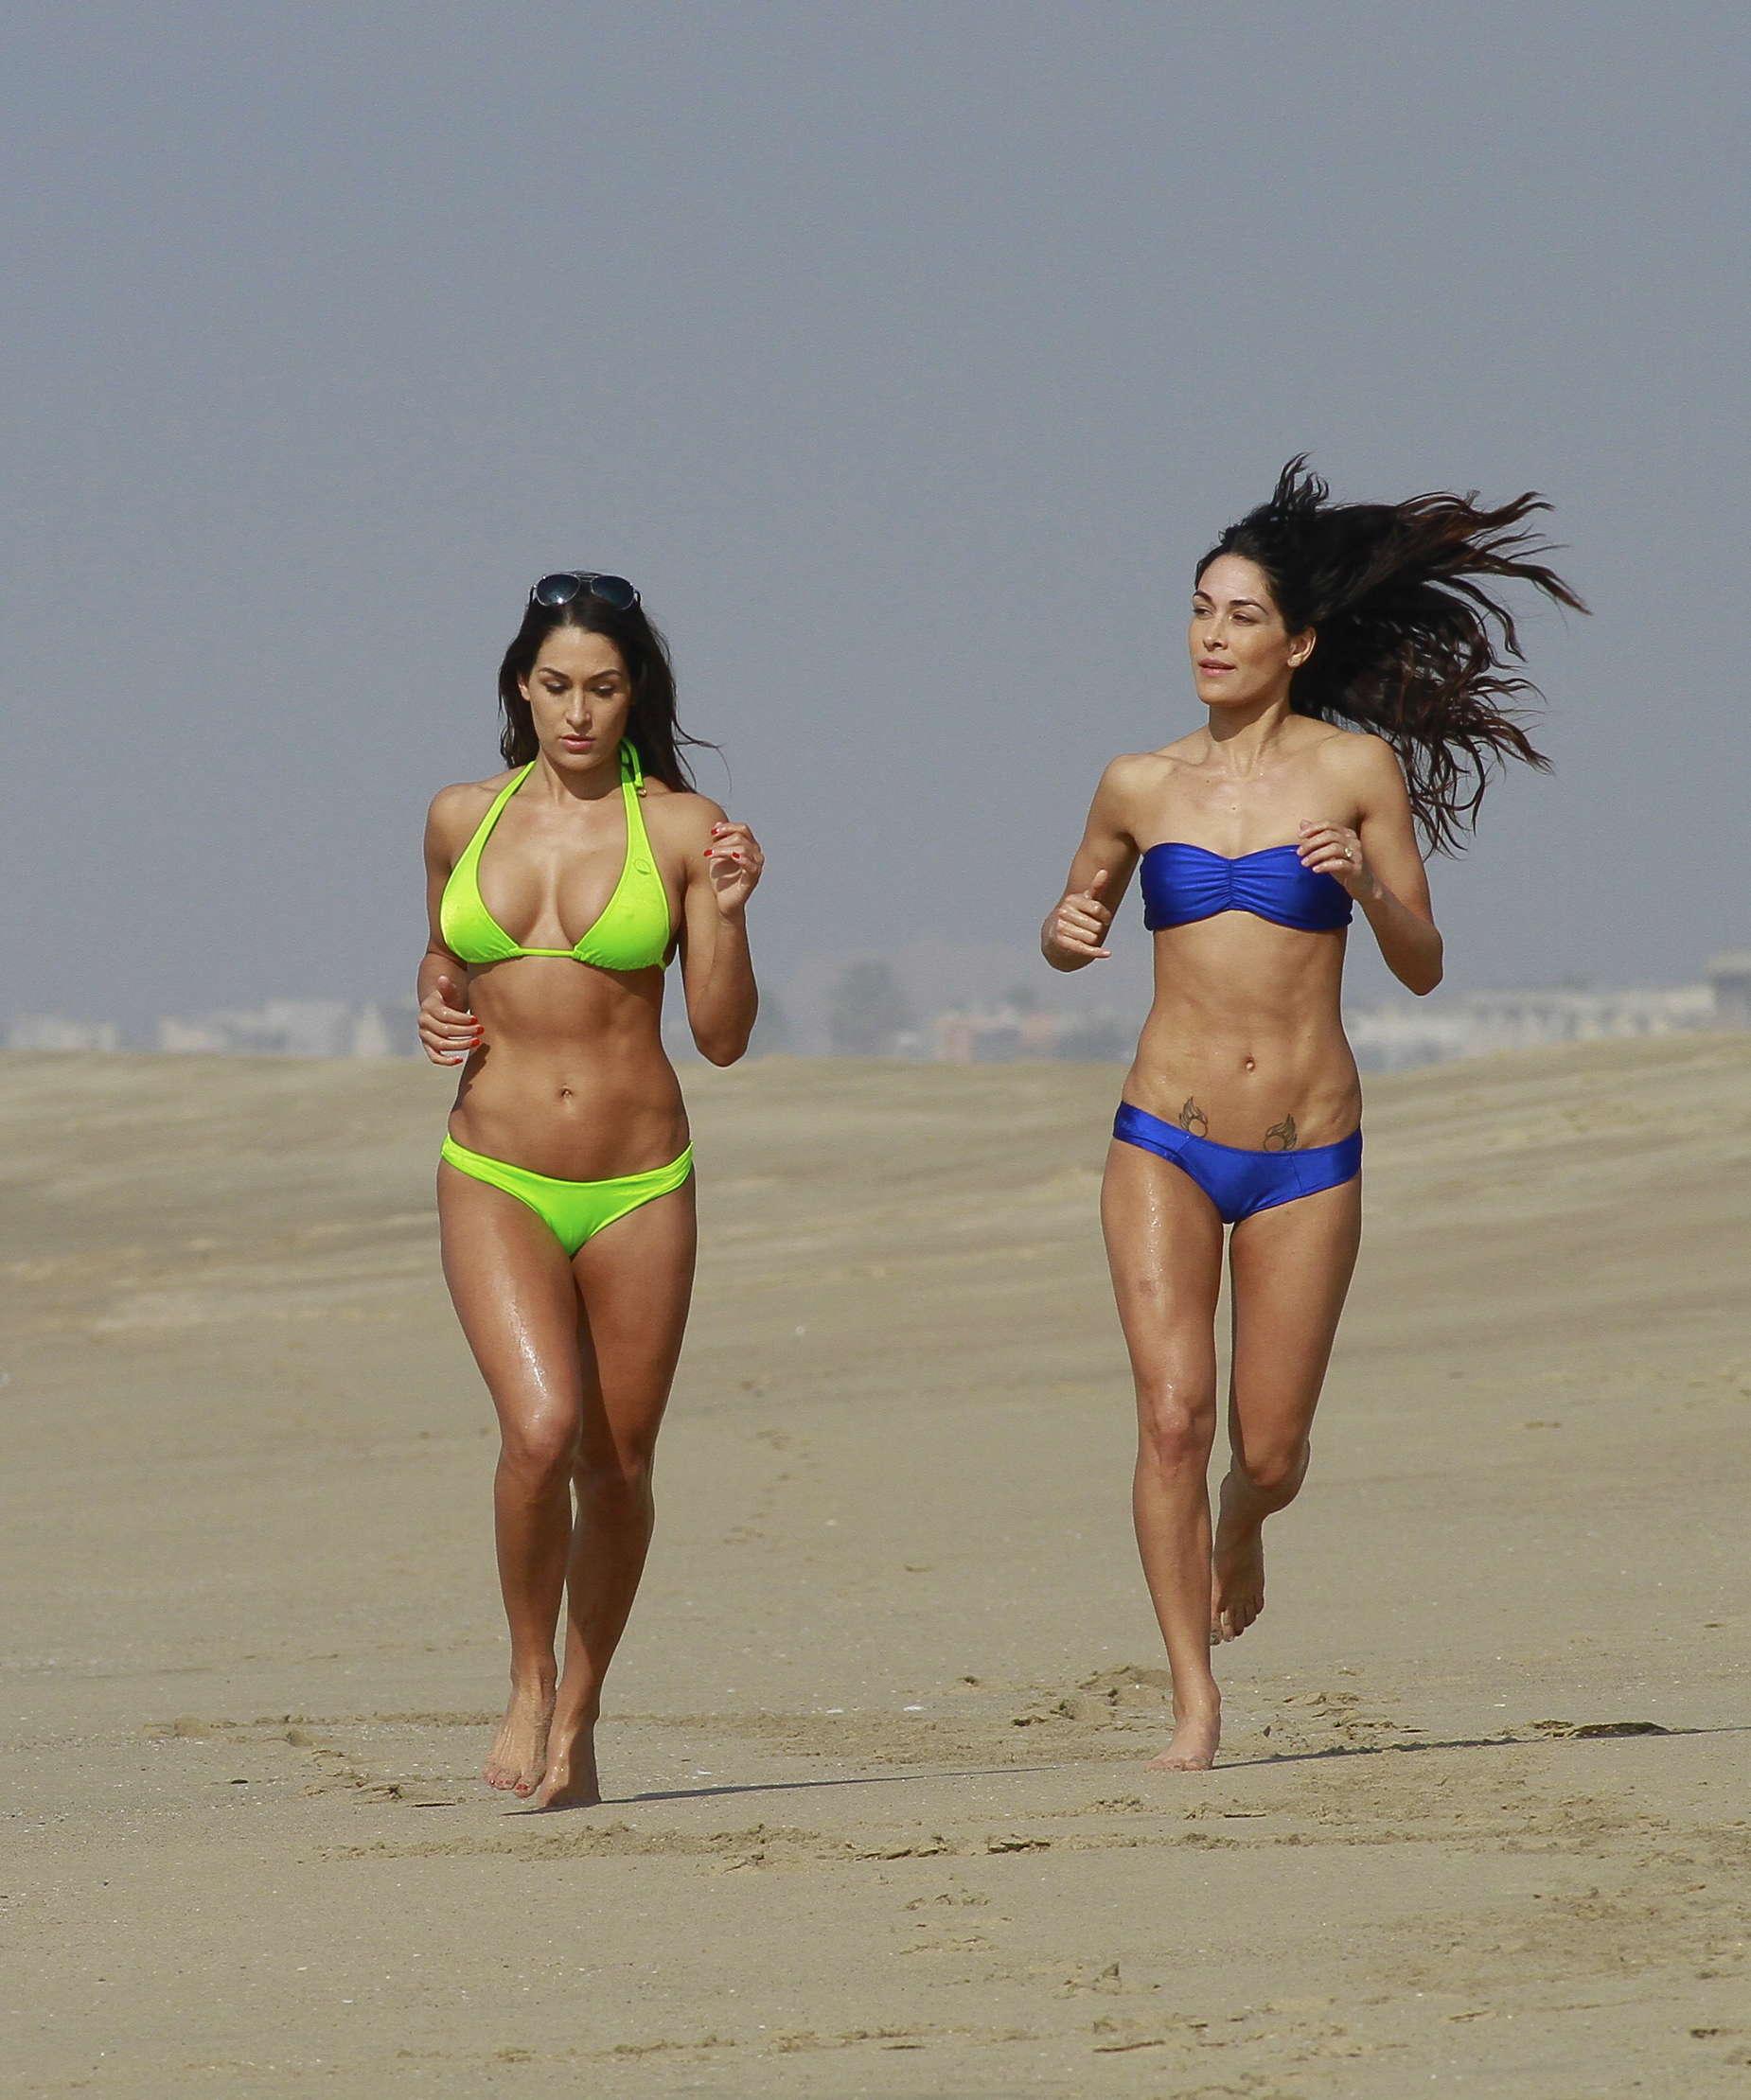 Pussy bikini twins italian brother usa naked